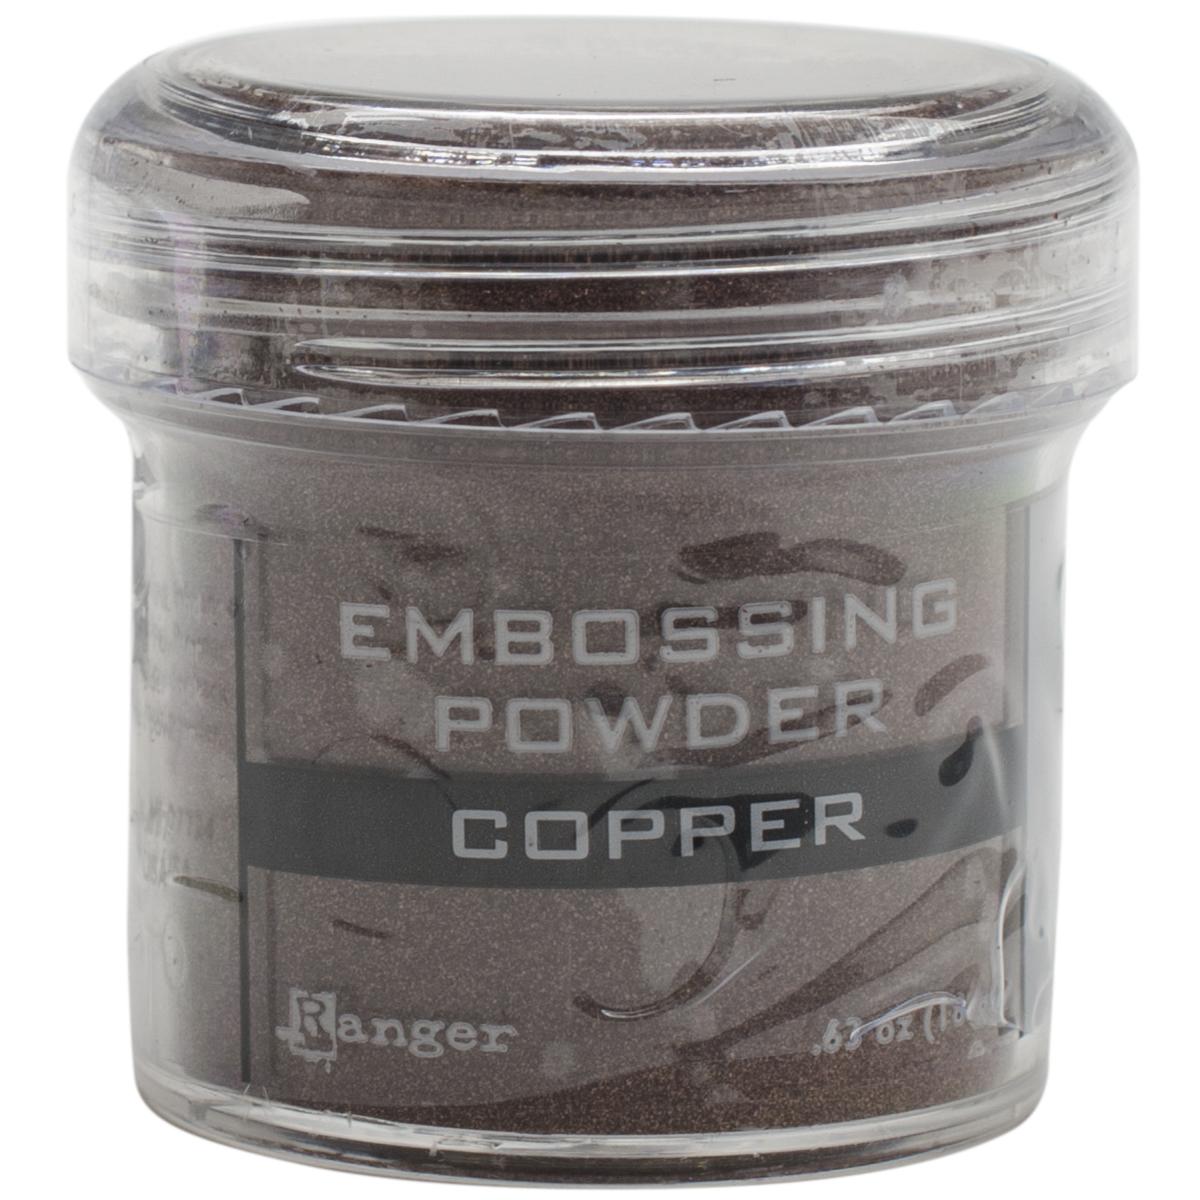 COPPER    -EMBOSSING POWDER 1OZ